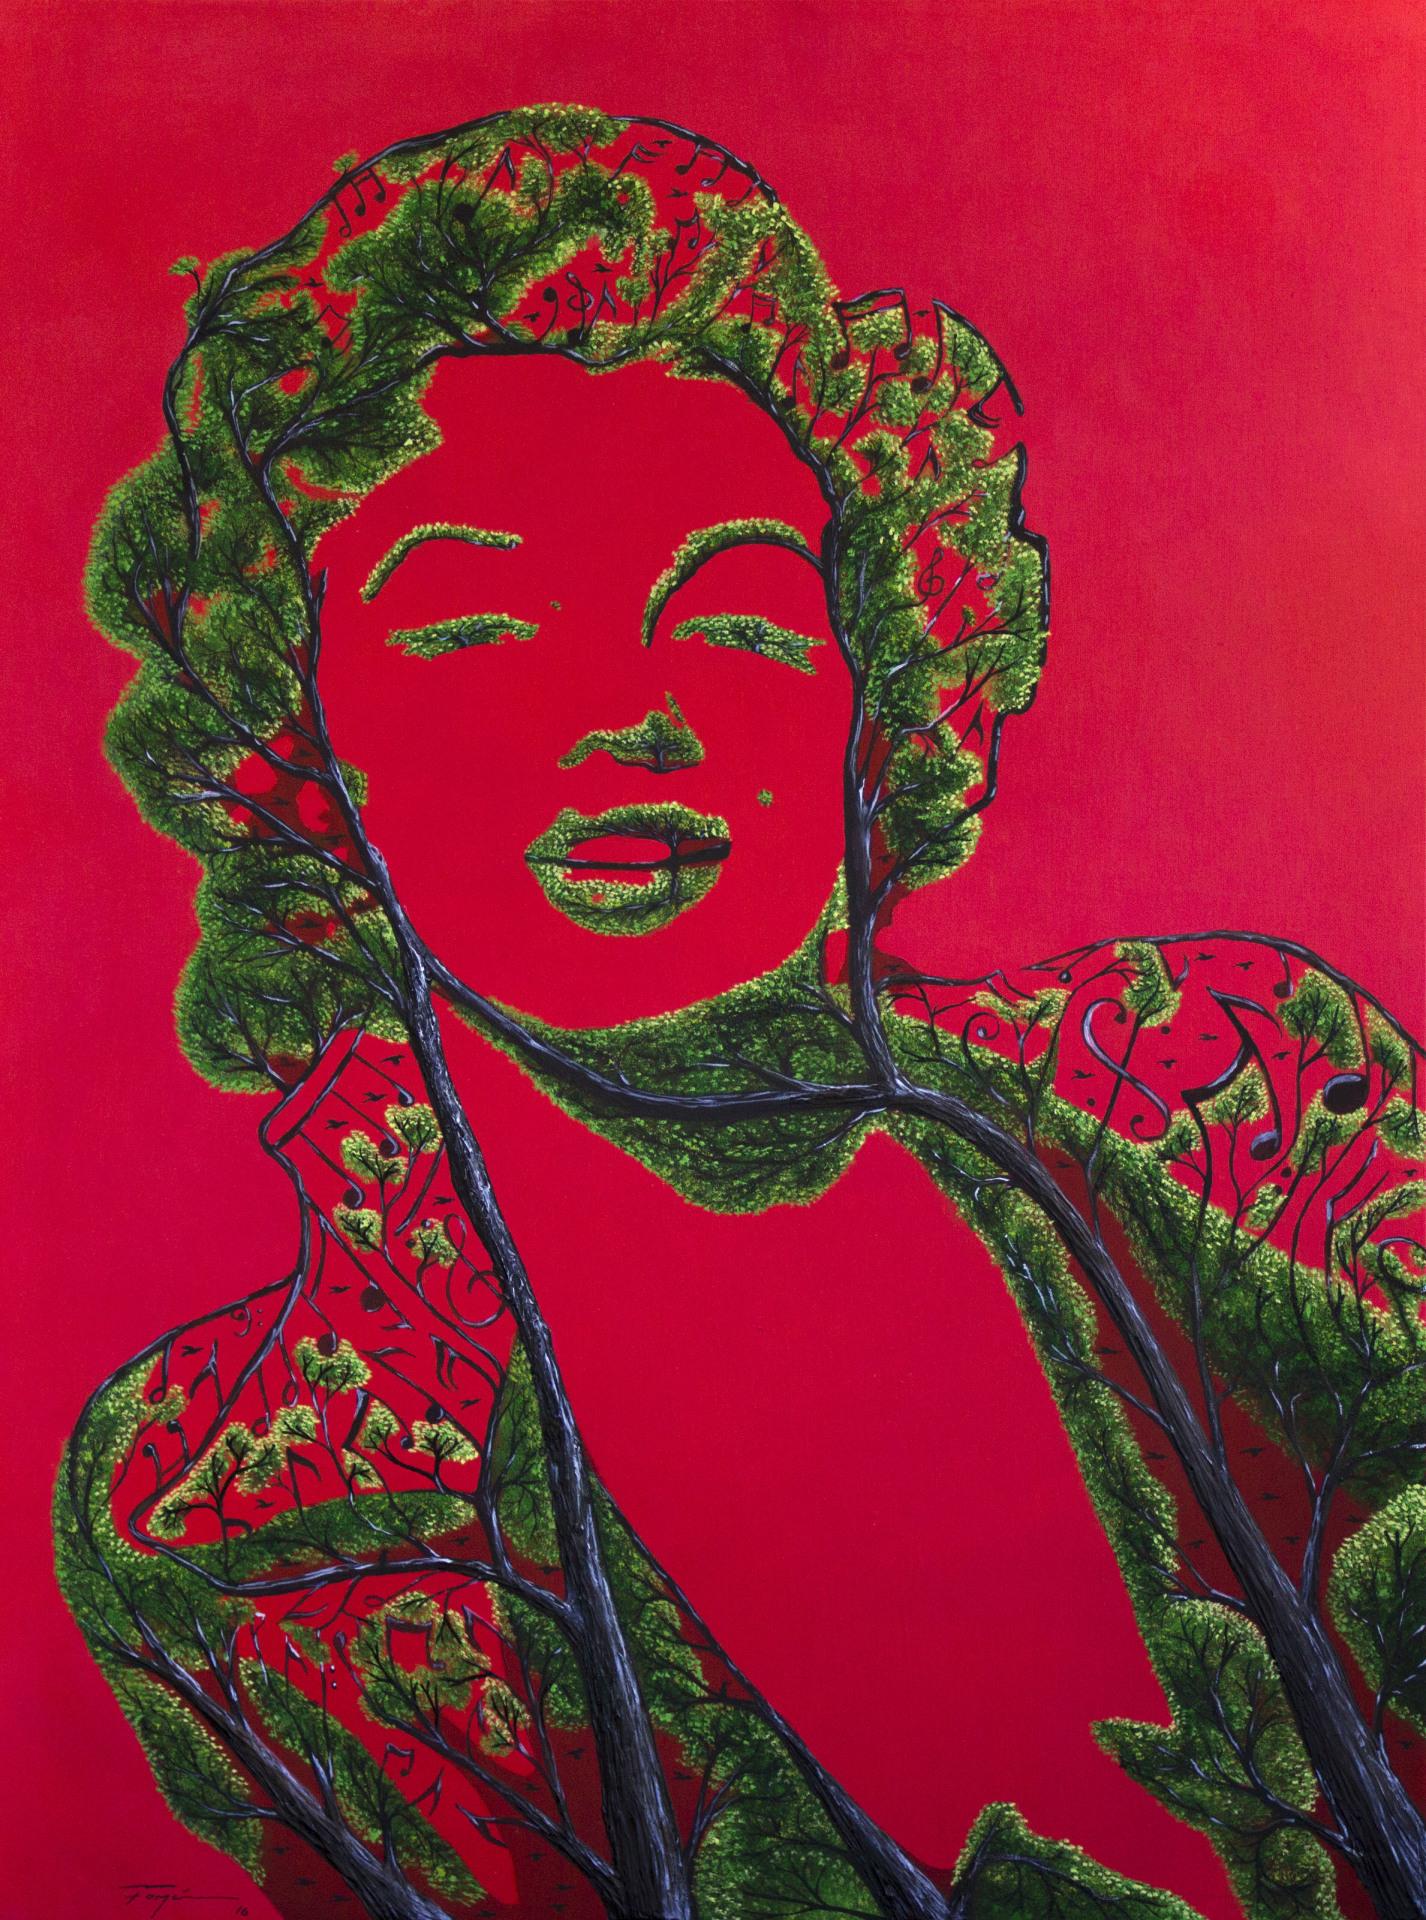 """Belleza de Mujer""  2016    30""x40"" Oleo on Canvas    Price: $ 12,000"